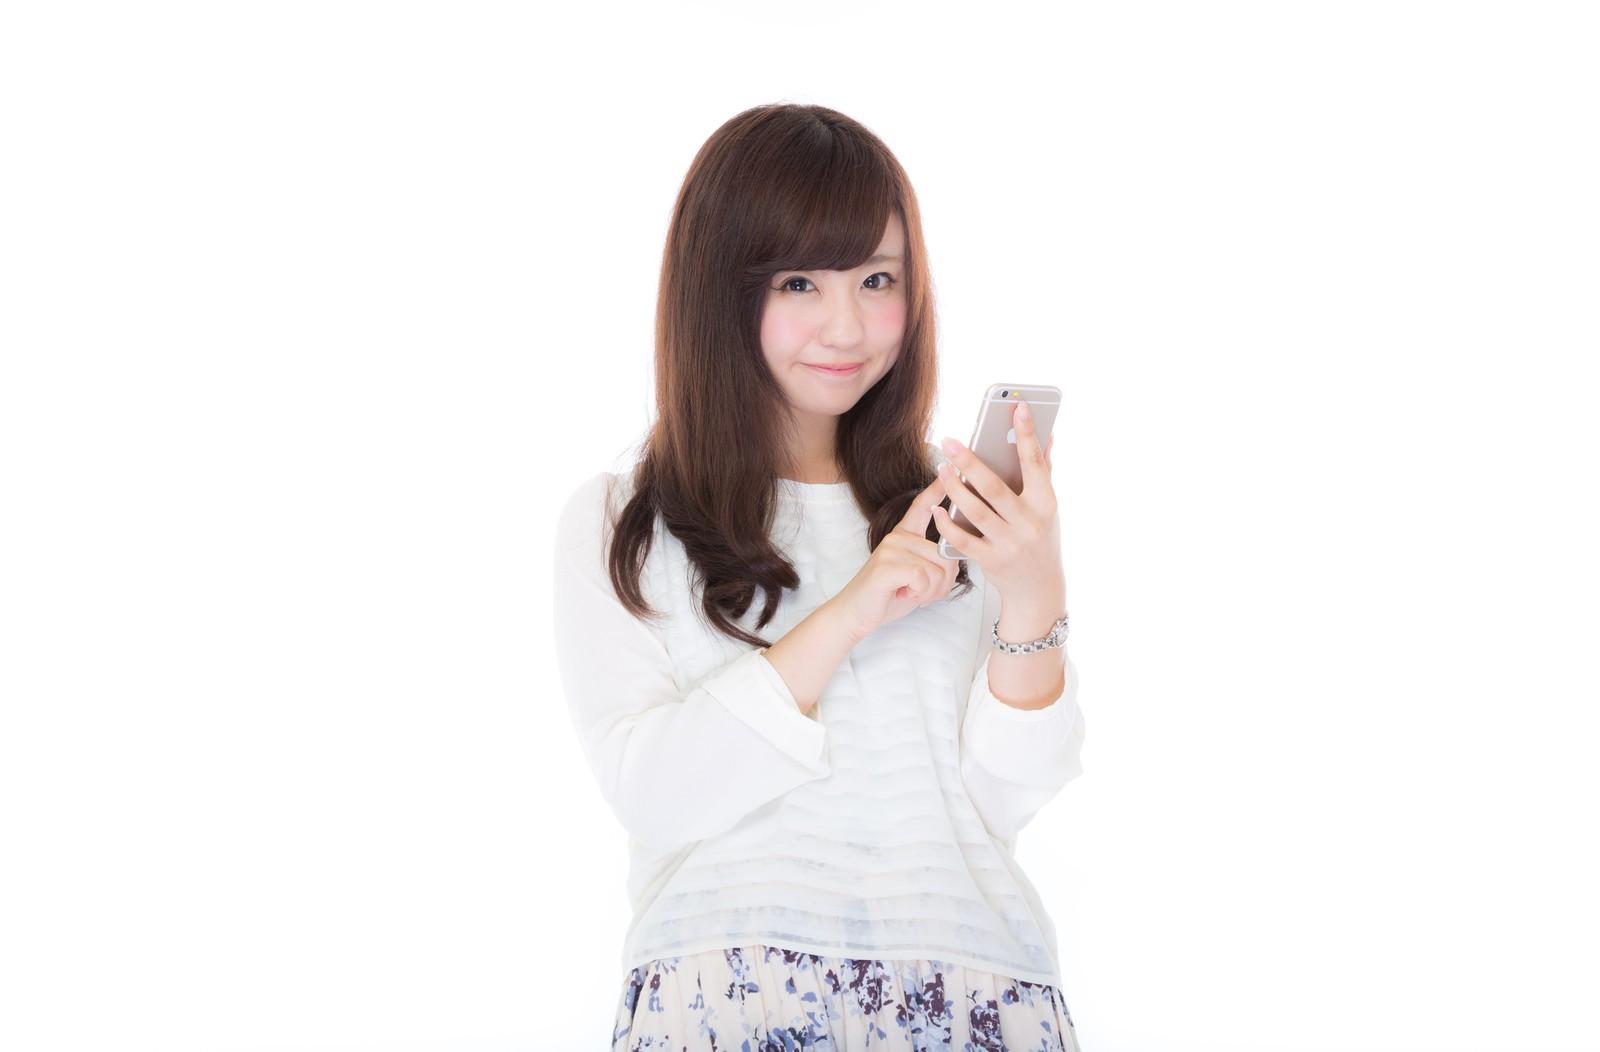 iPhone 7 SIMフリー版の購入をお勧めする女性